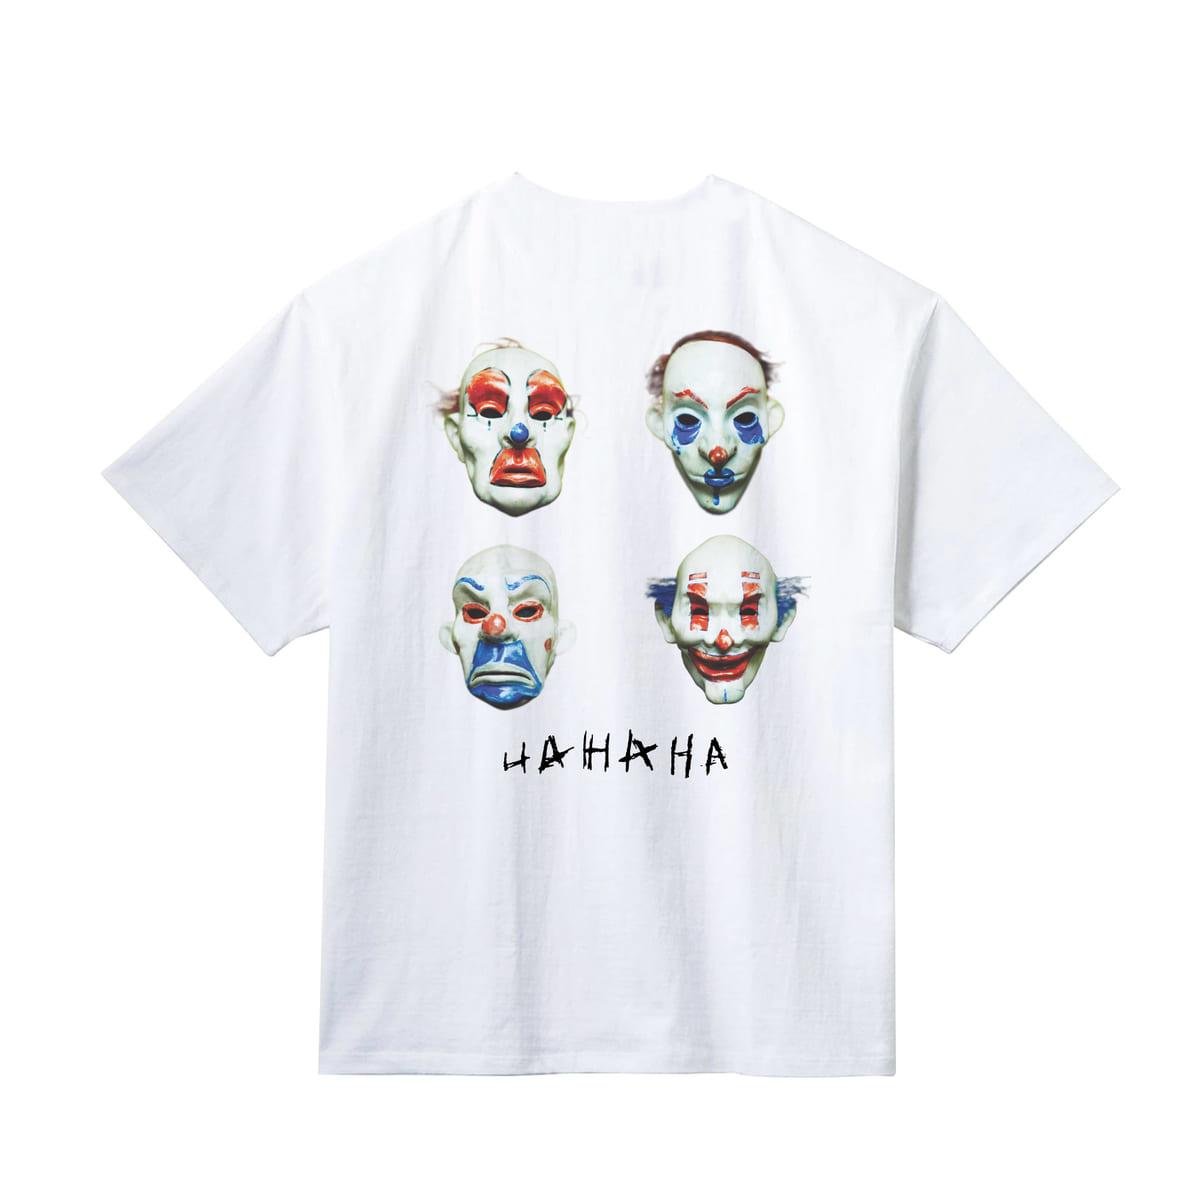 Tシャツ ジョーカー